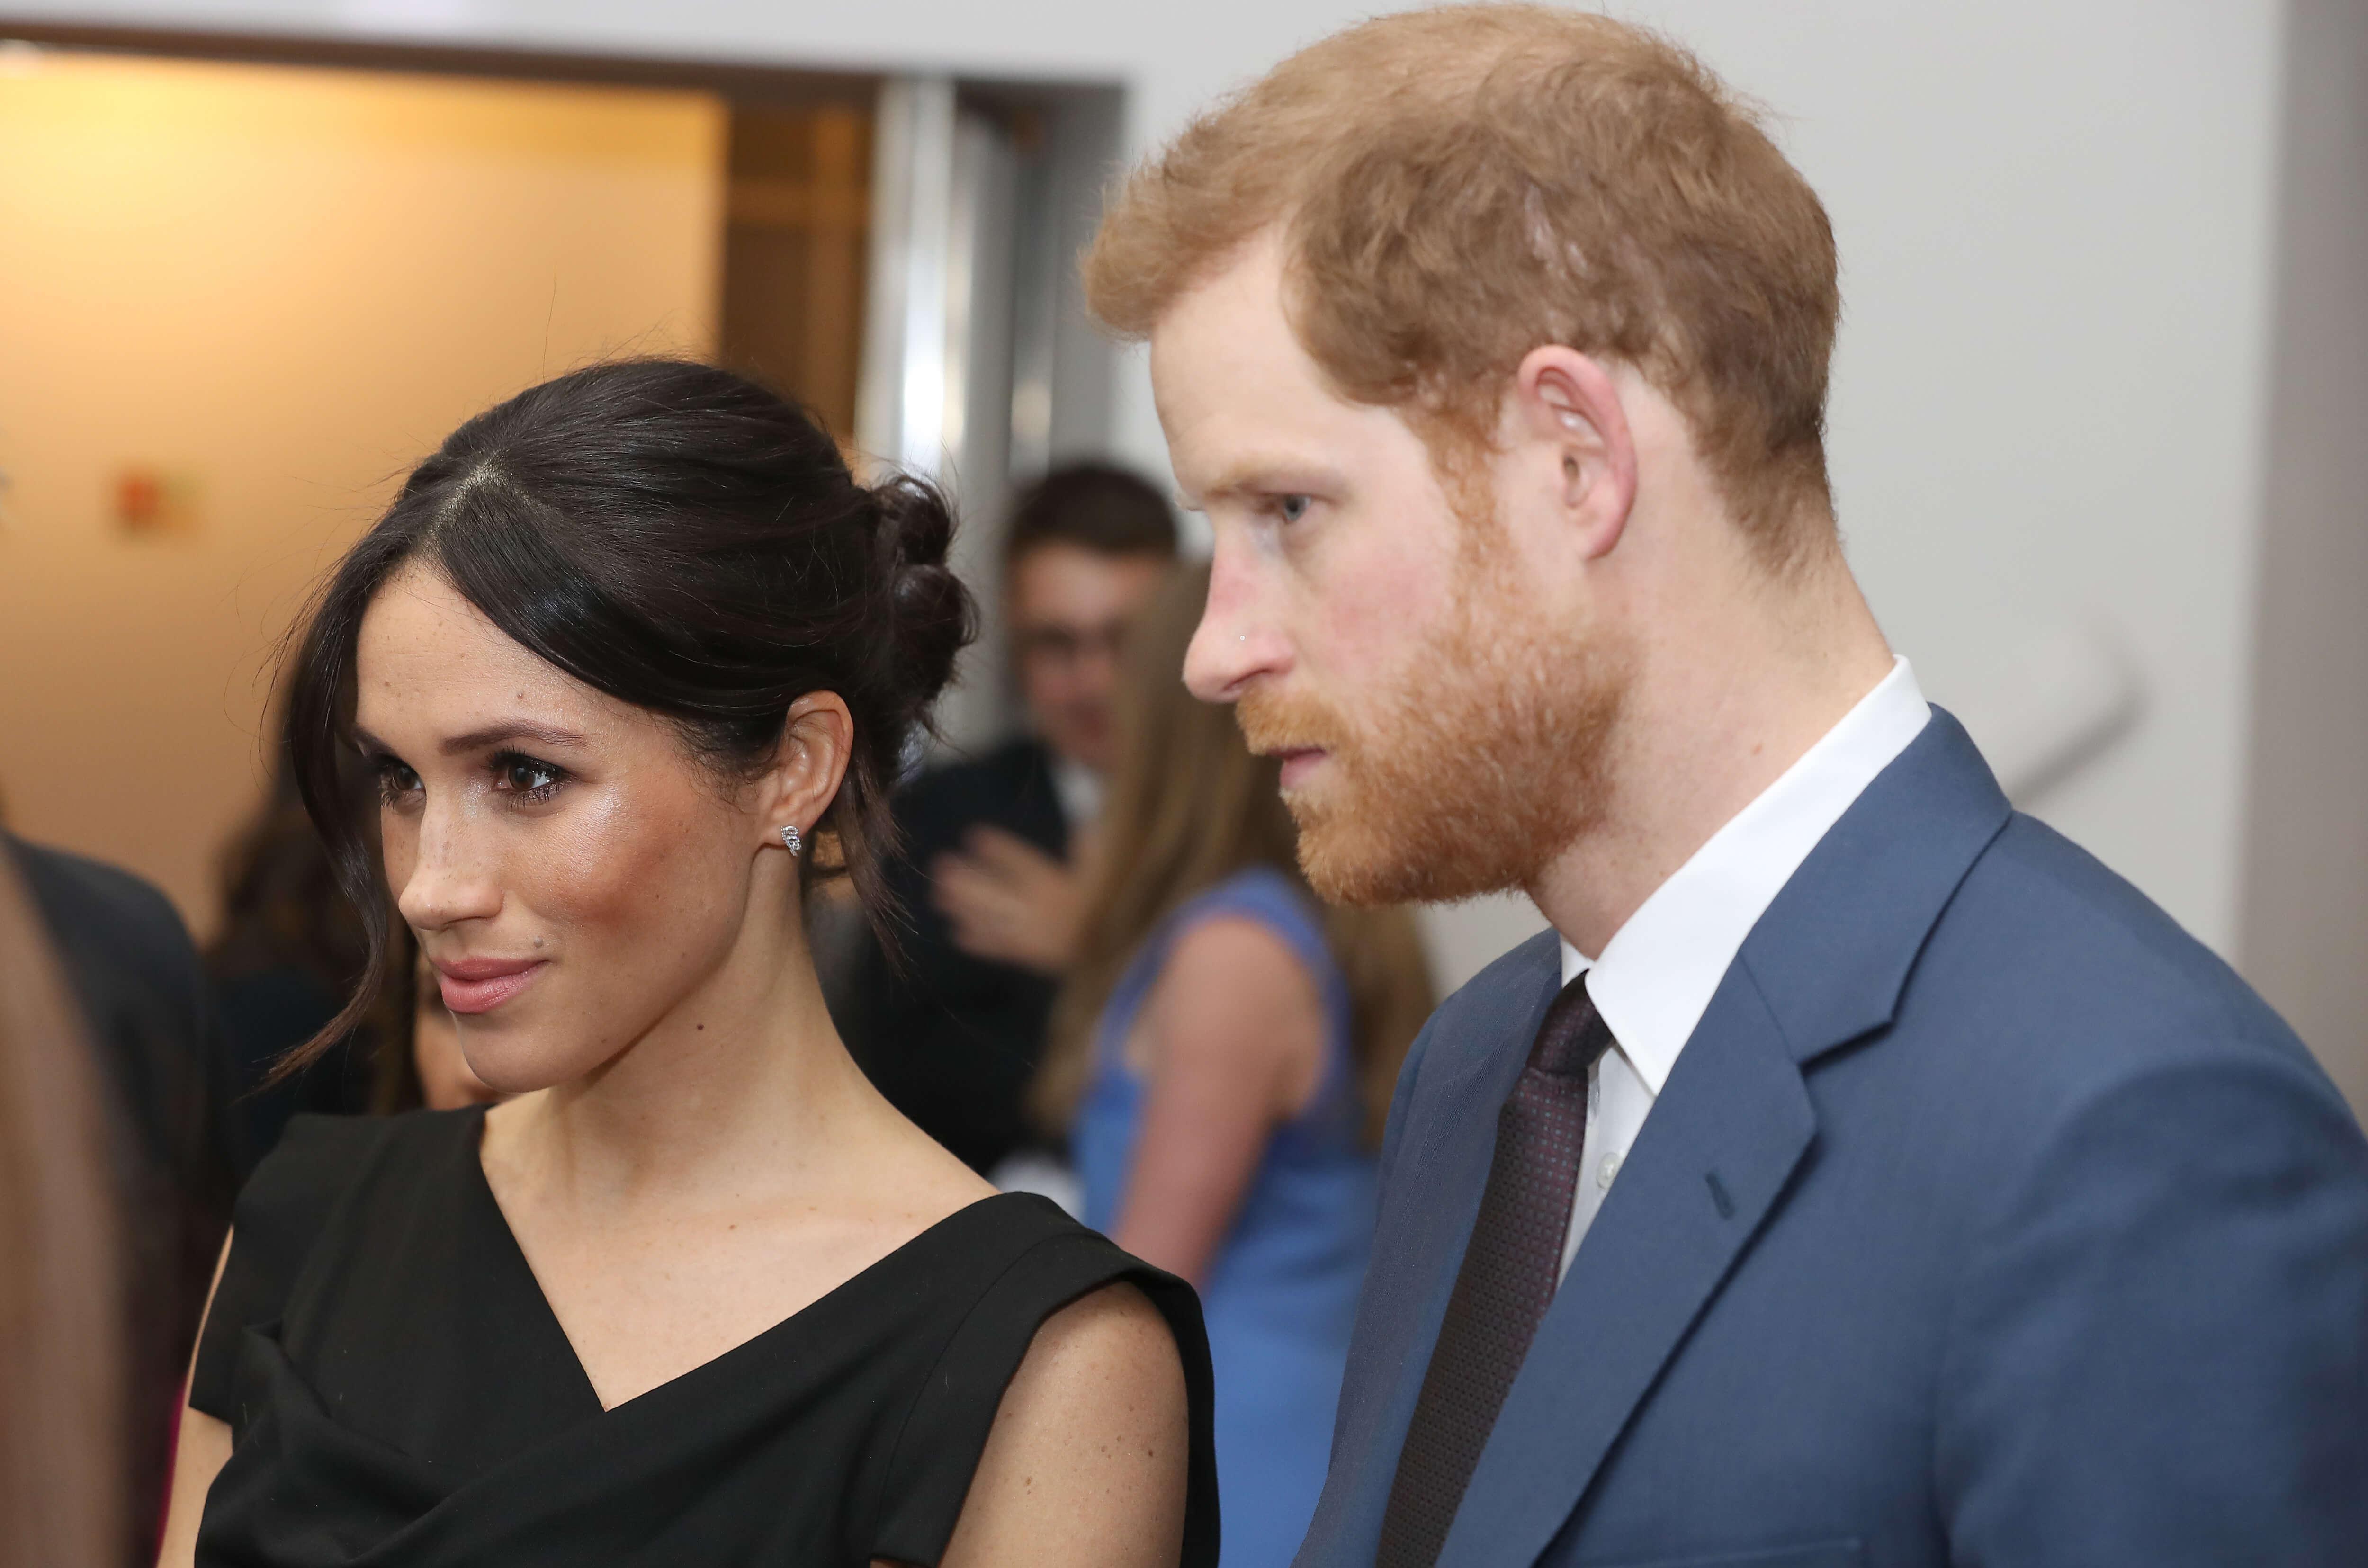 Herzogin Meghan & Prinz Harry: Eindringling in ihrem Zuhause